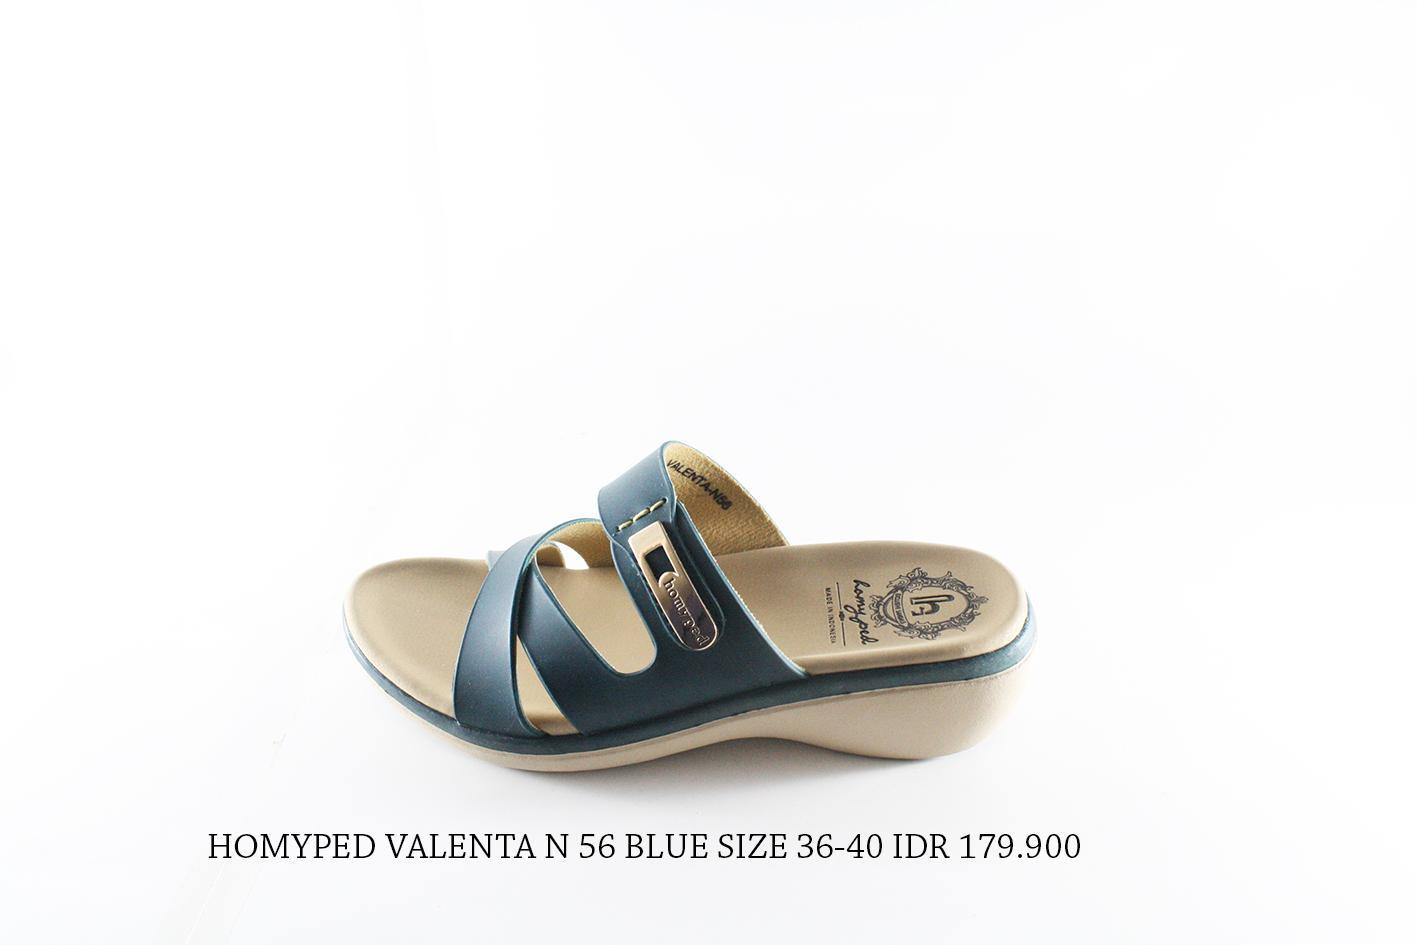 homyped valenta 56 sandal casual wanita biru